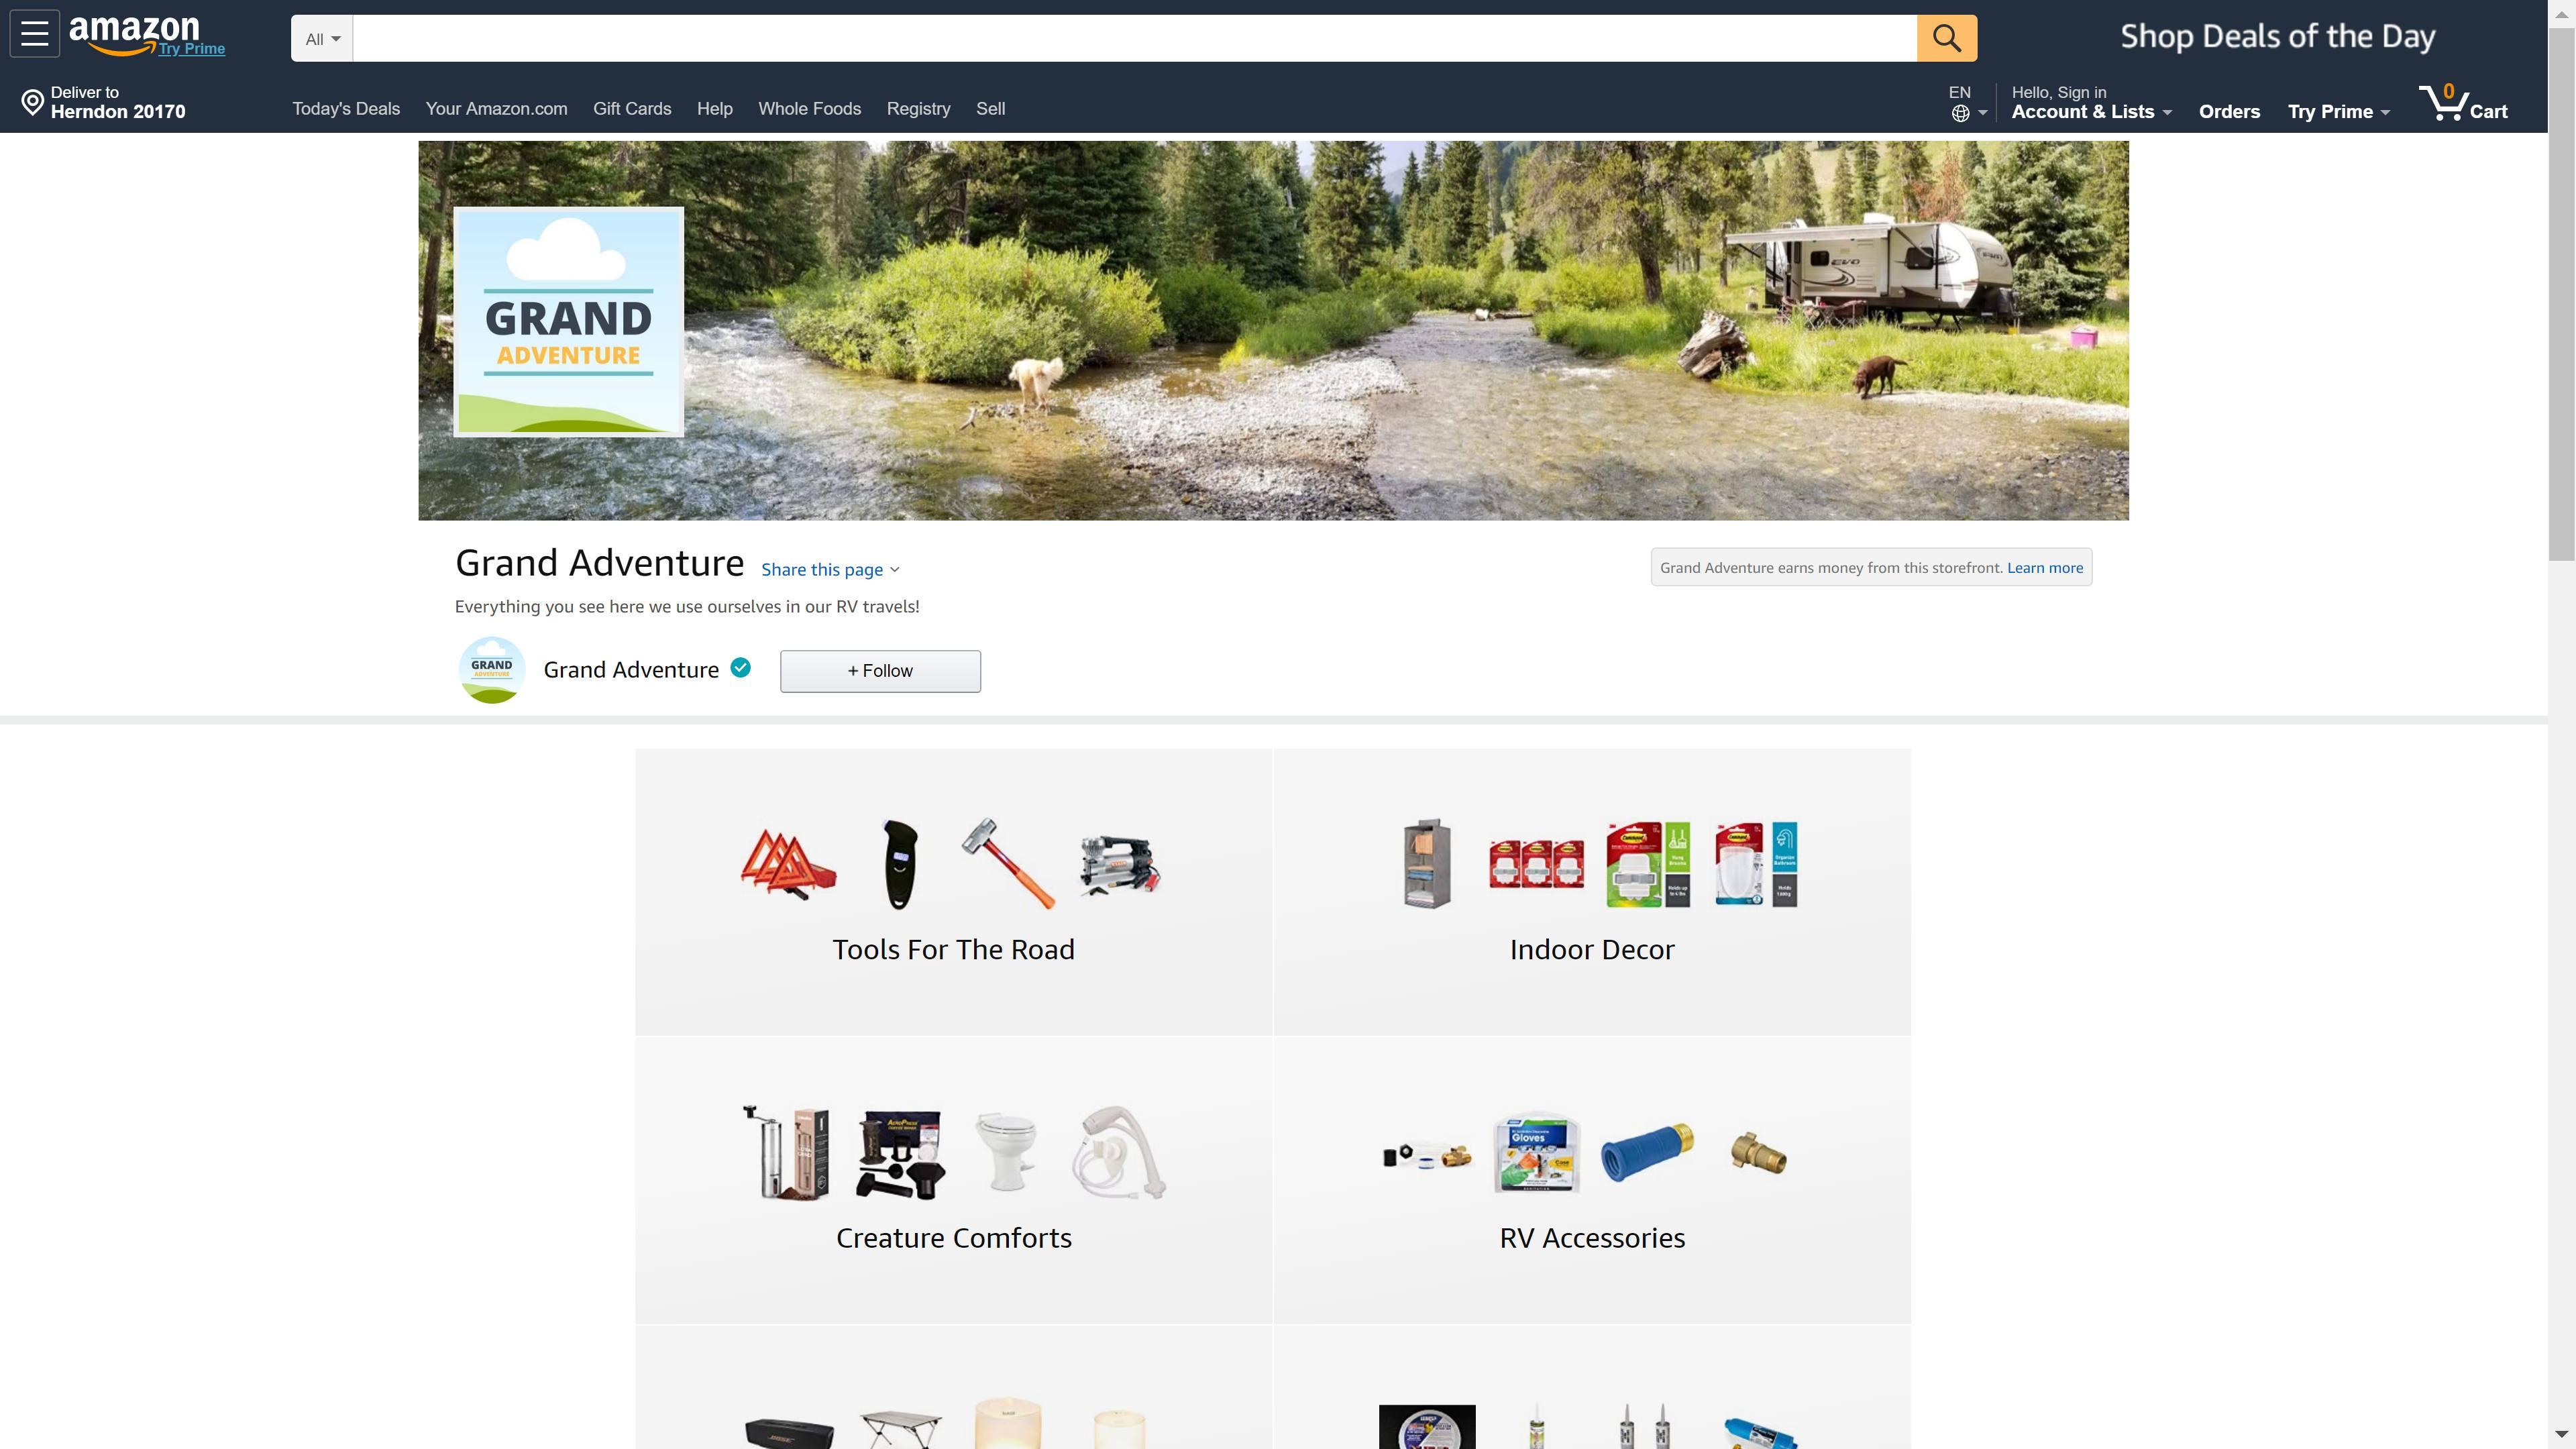 Grand Adventure on Amazon